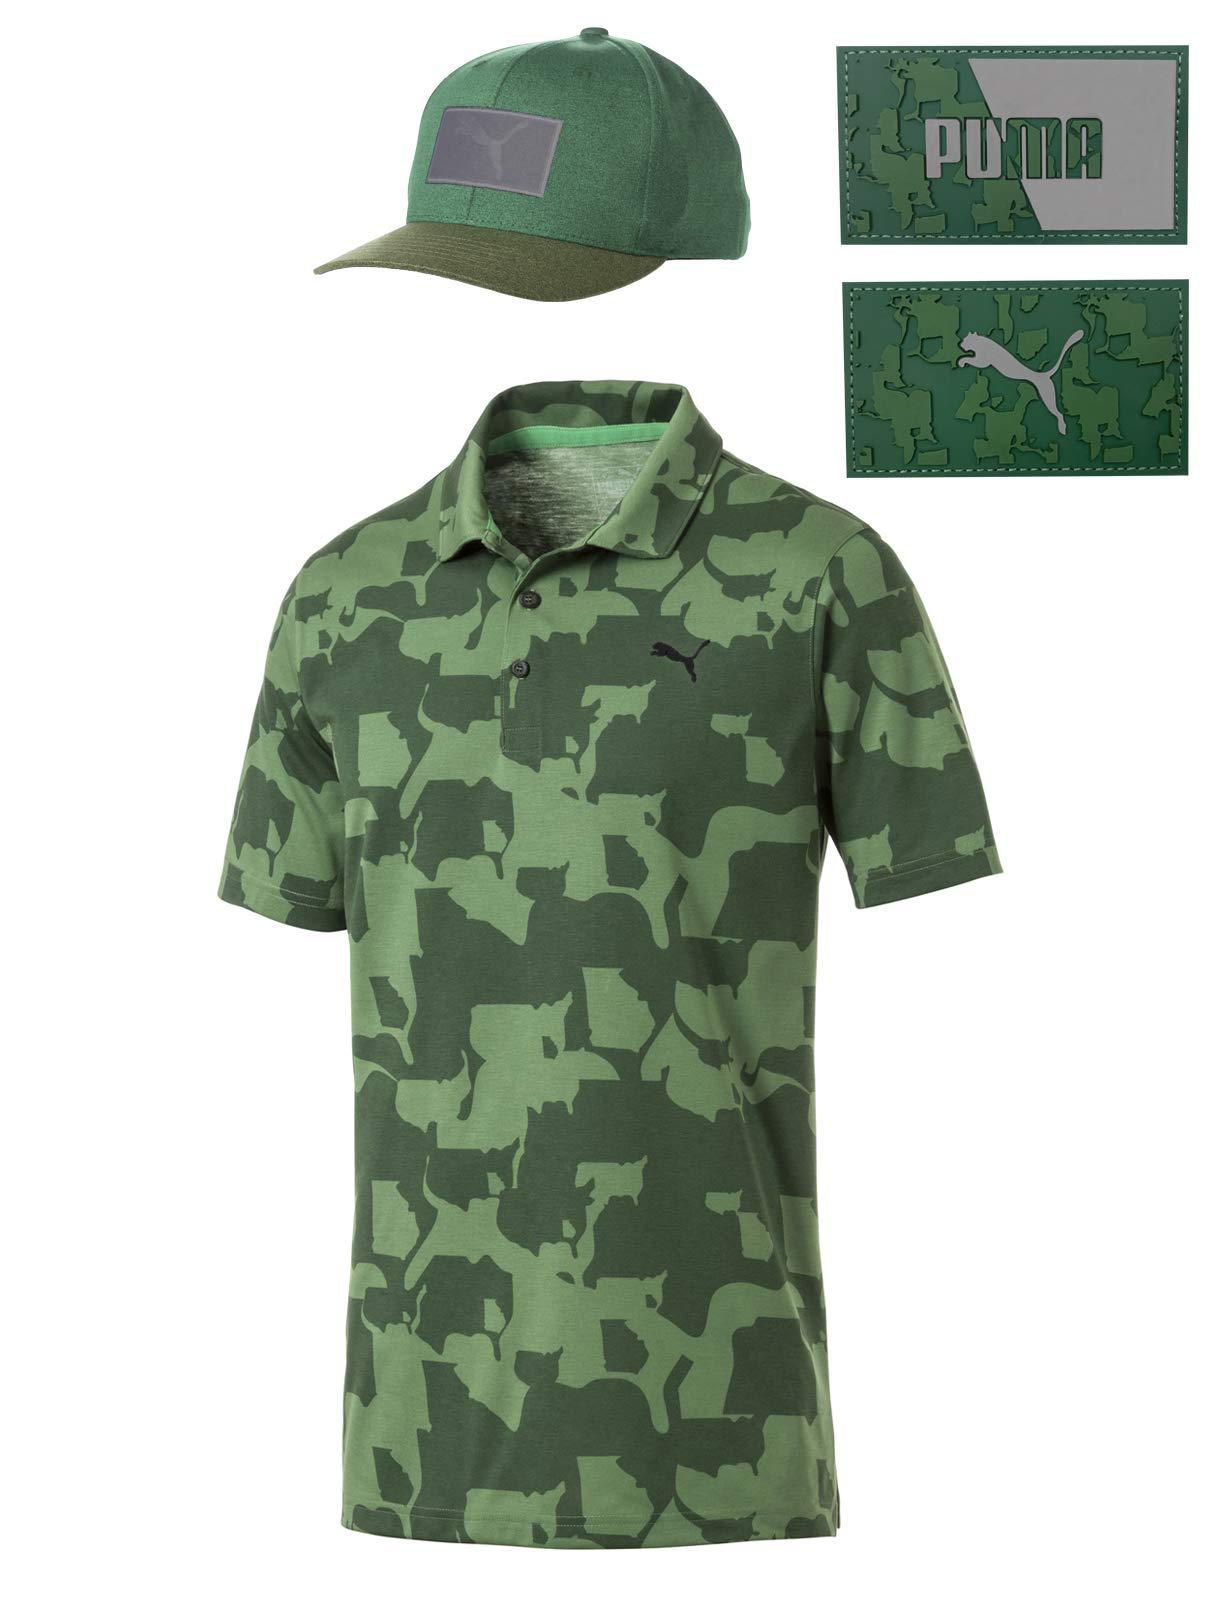 Rickie Fowler Masters Puma Golf Polo & Hat Bundle (2019)   Puma Union Camo Polo & Union Camo 110 Snapback (Juniper/Greener Pastures, Large)